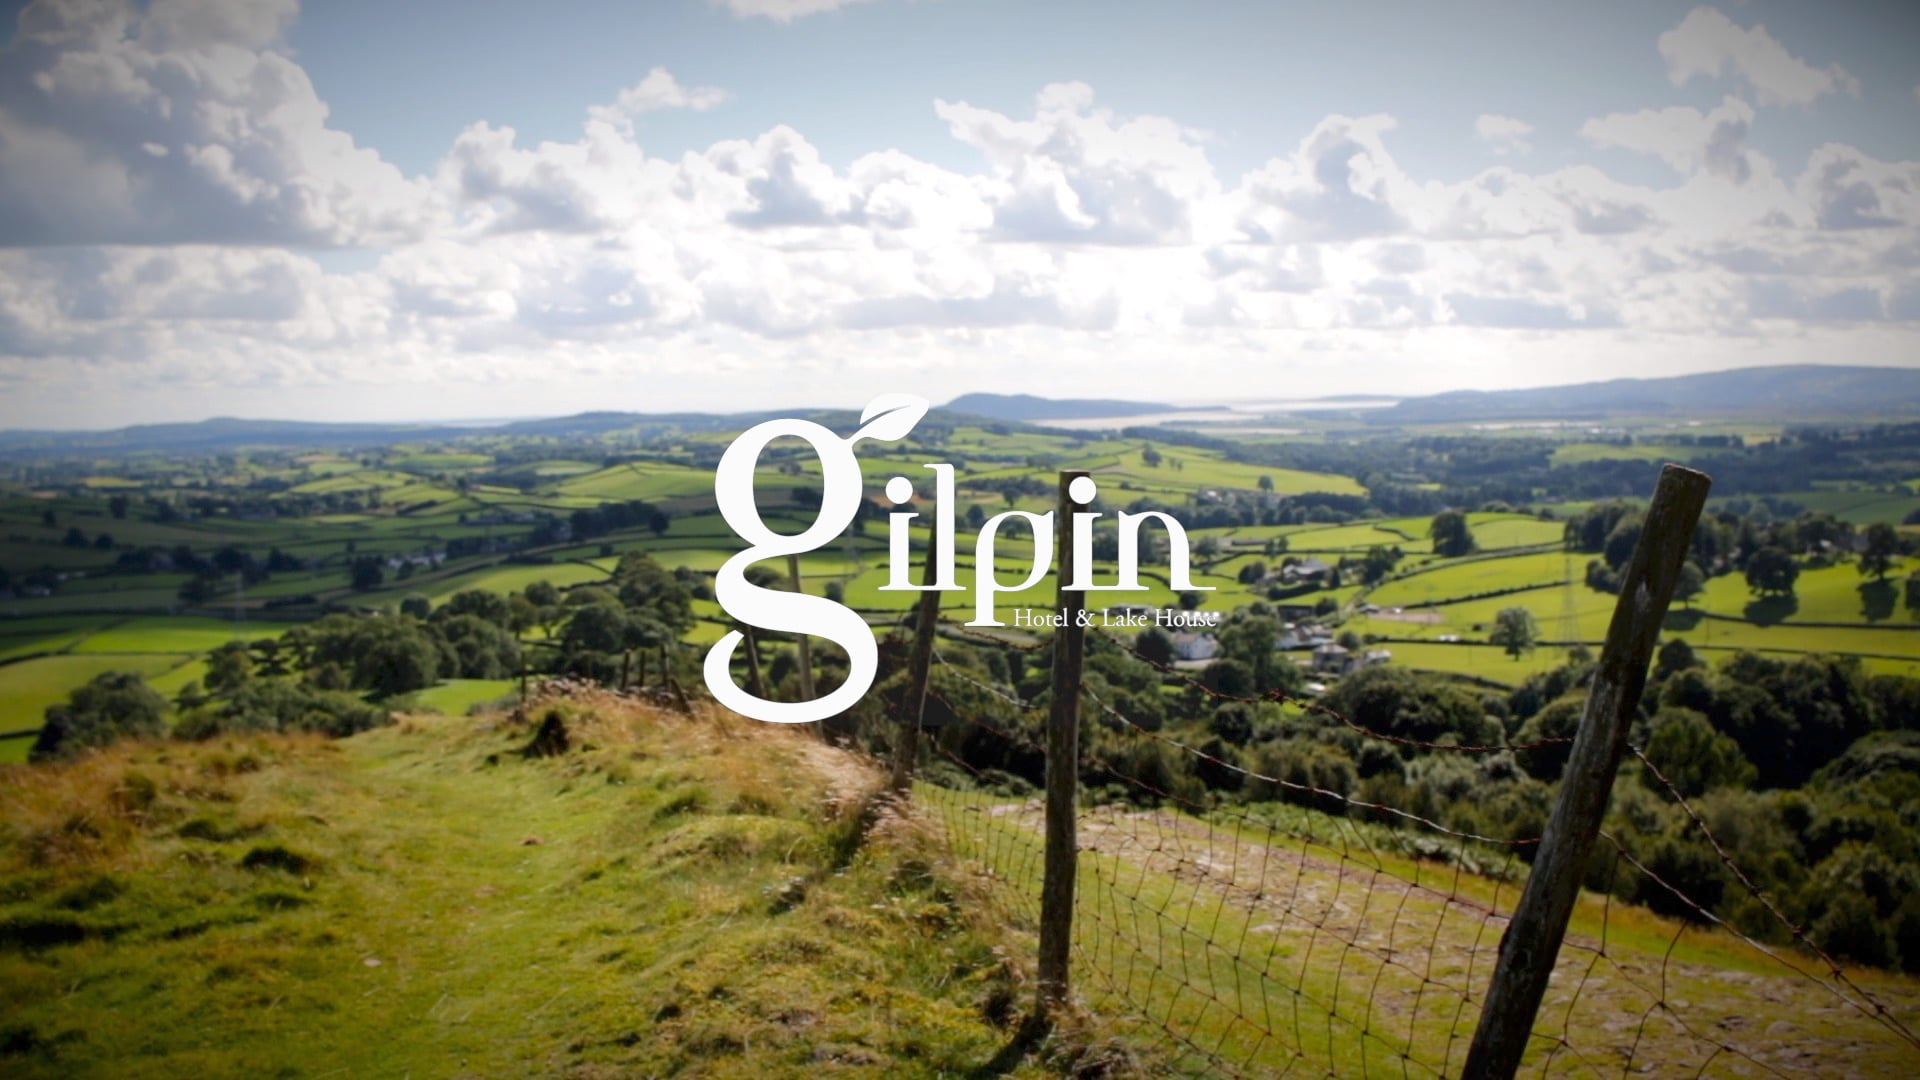 Gilpin Hotel: Staff Living